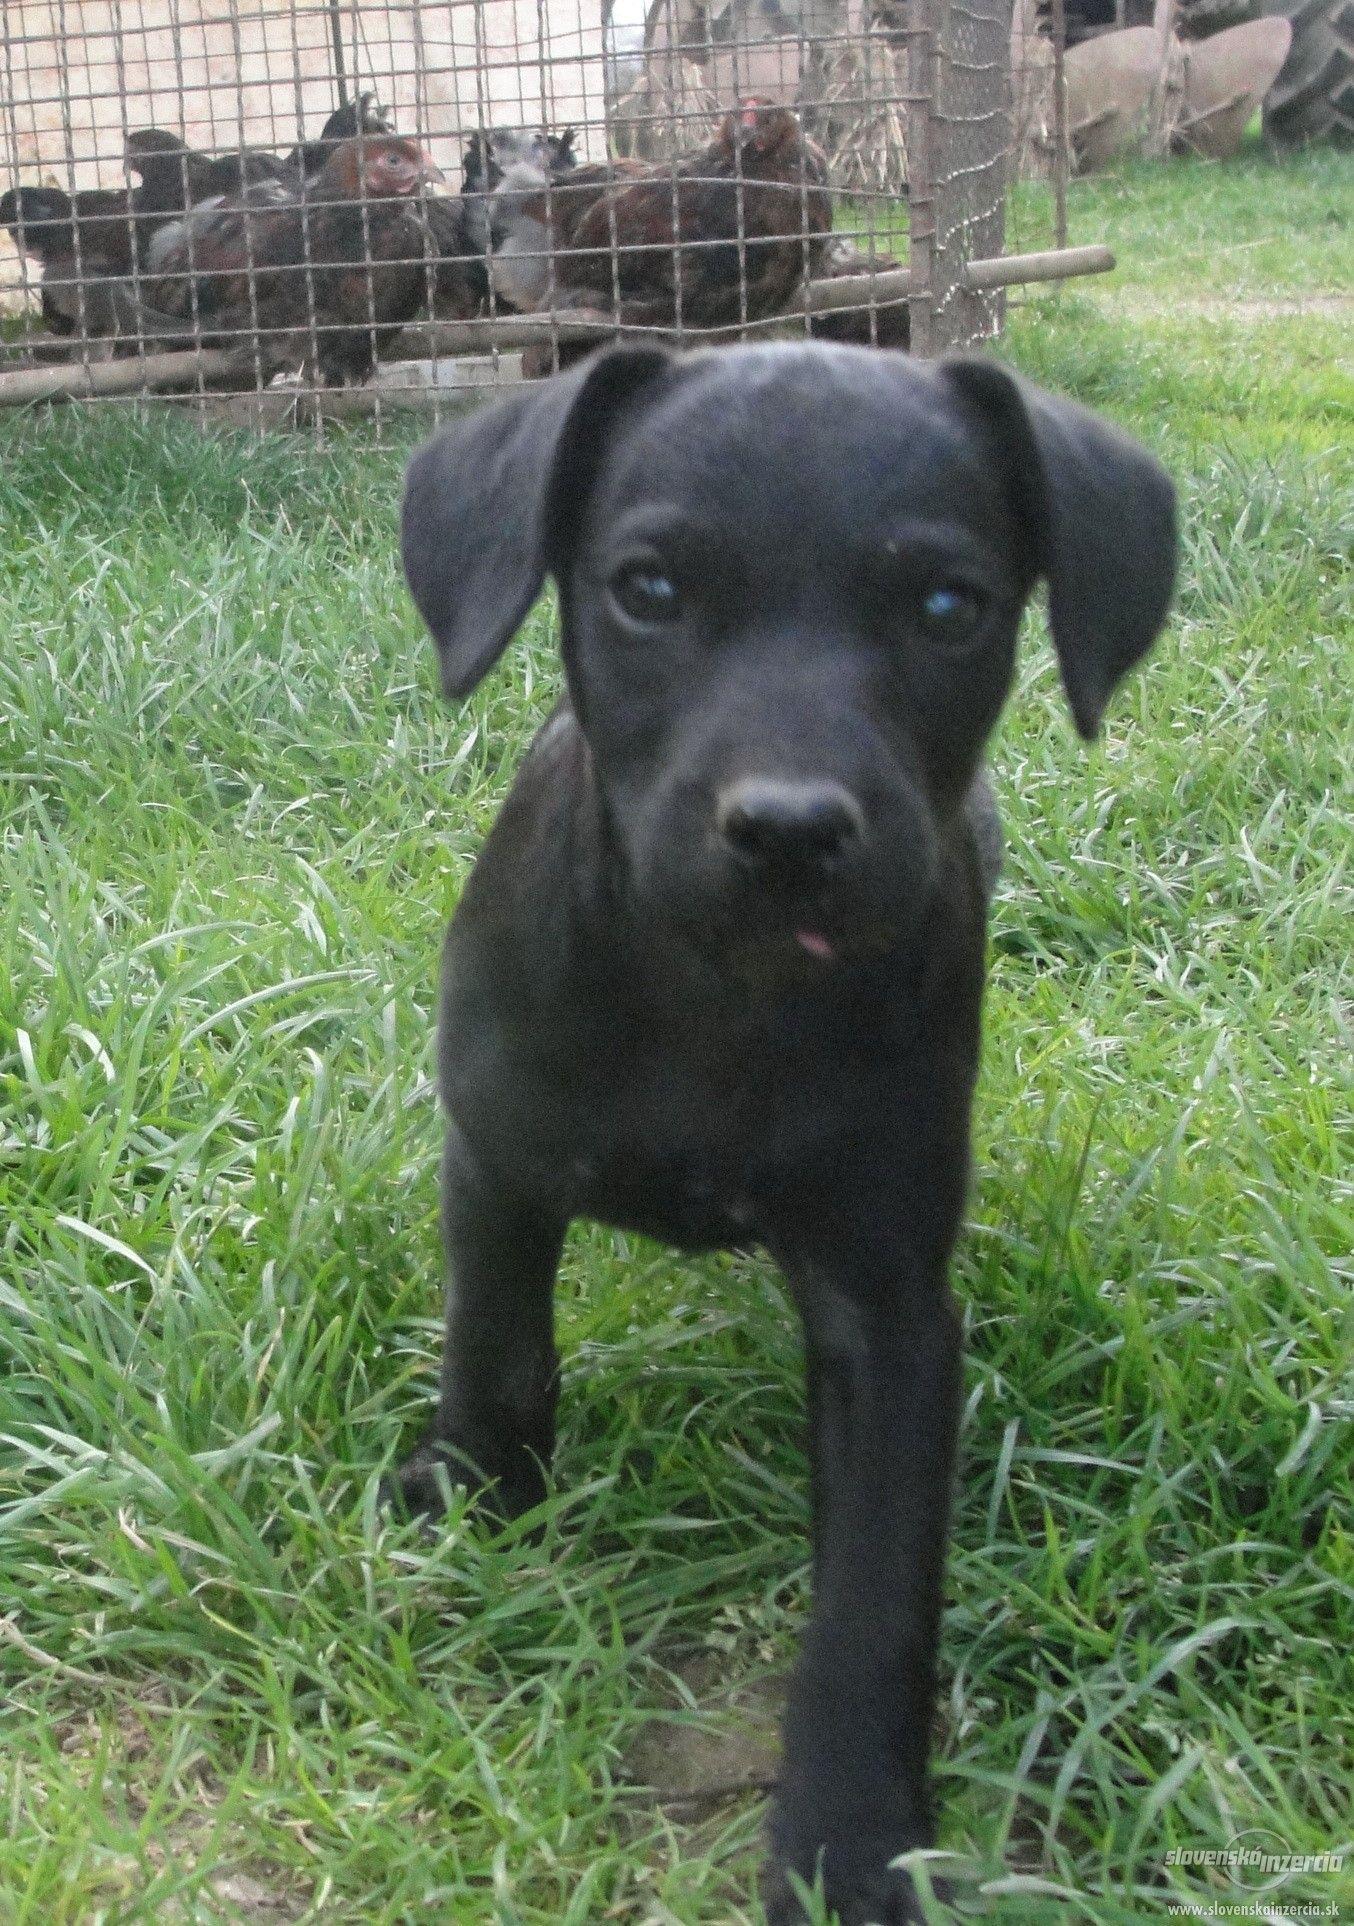 Patterdale terrier. Inzercia - Zvieratá 4e31c248f77